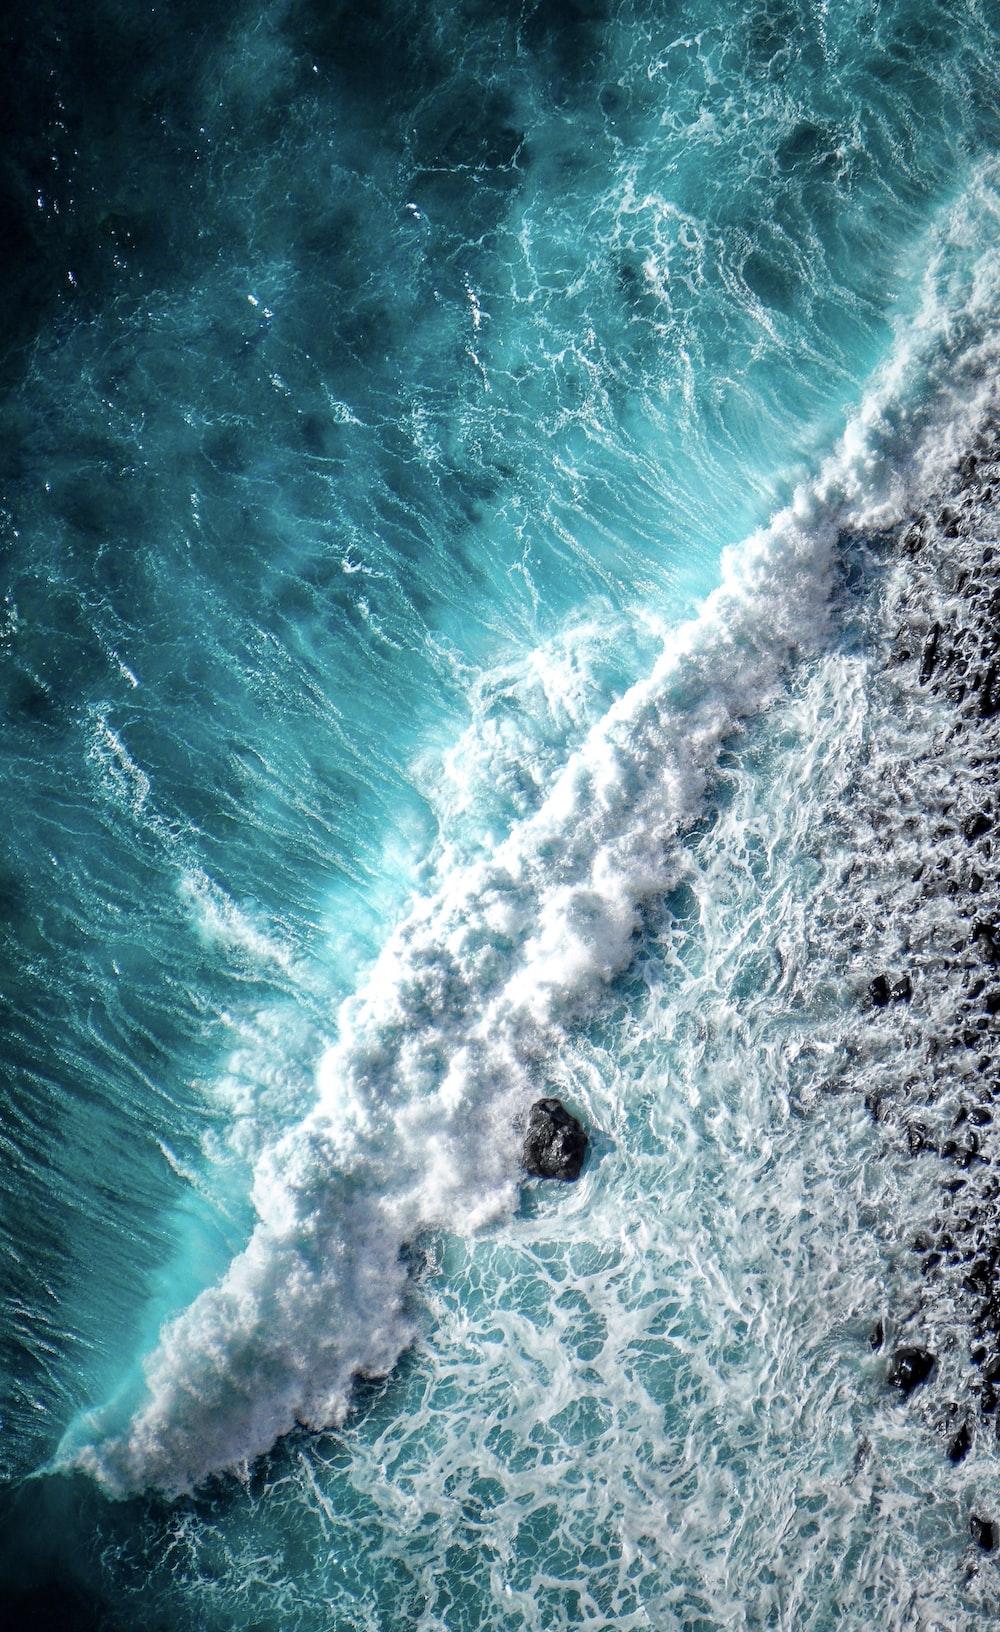 Ocean Wallpapers Free HD Download [9+ HQ]   Unsplash